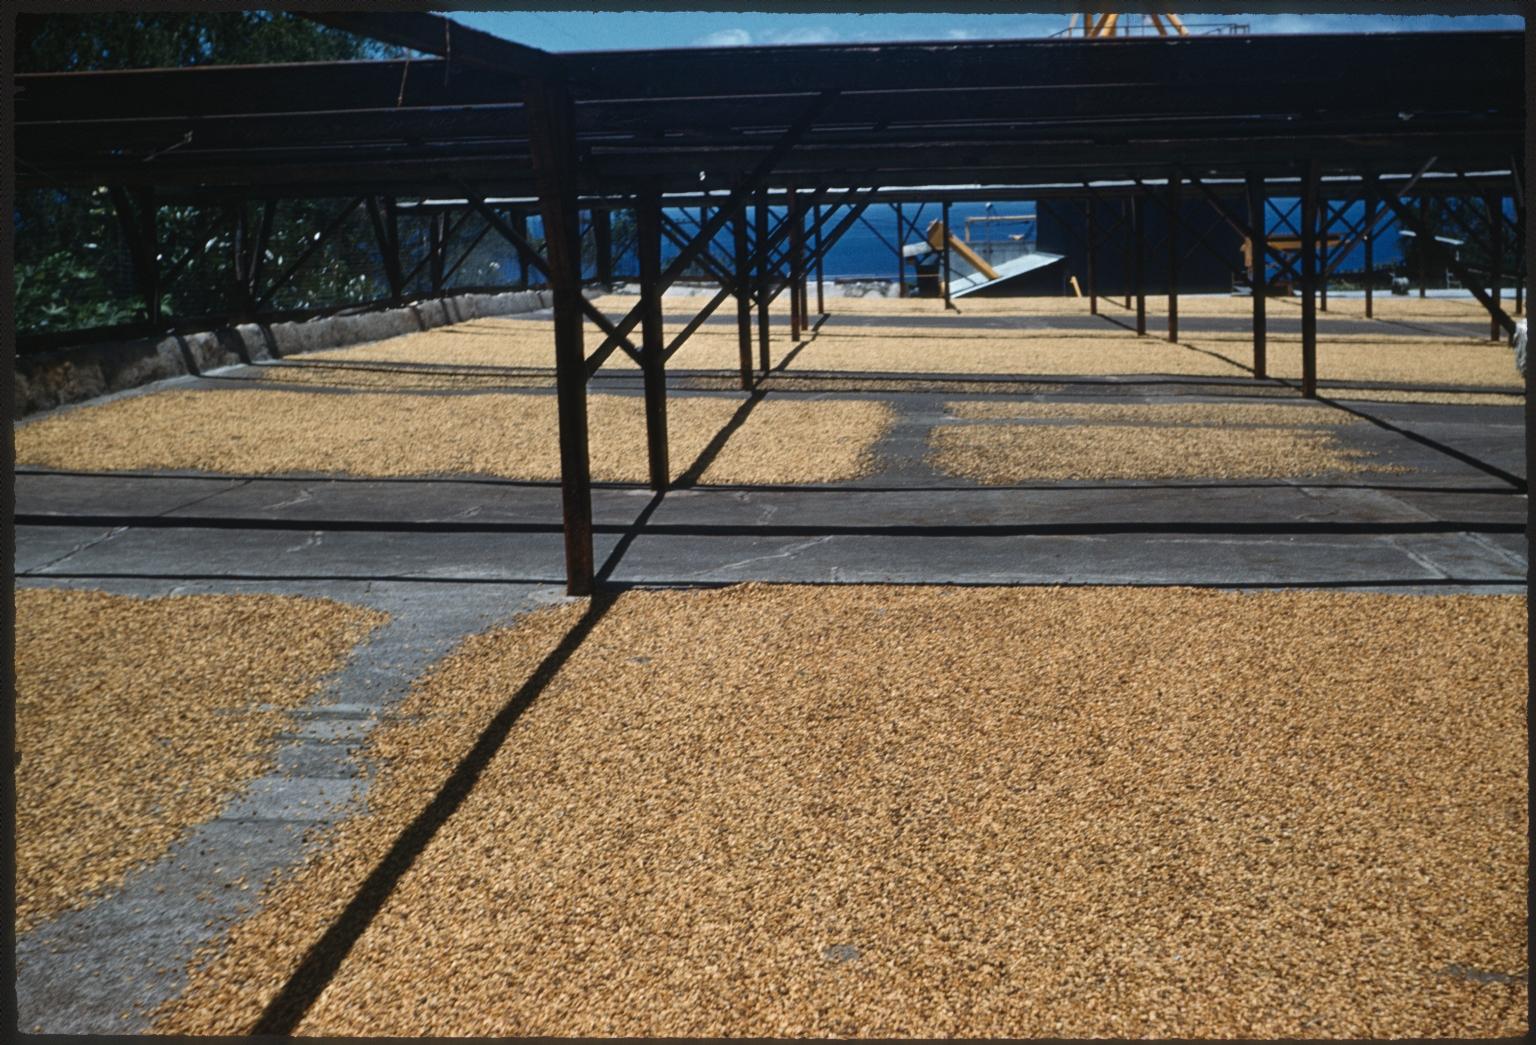 Coffee beans air drying